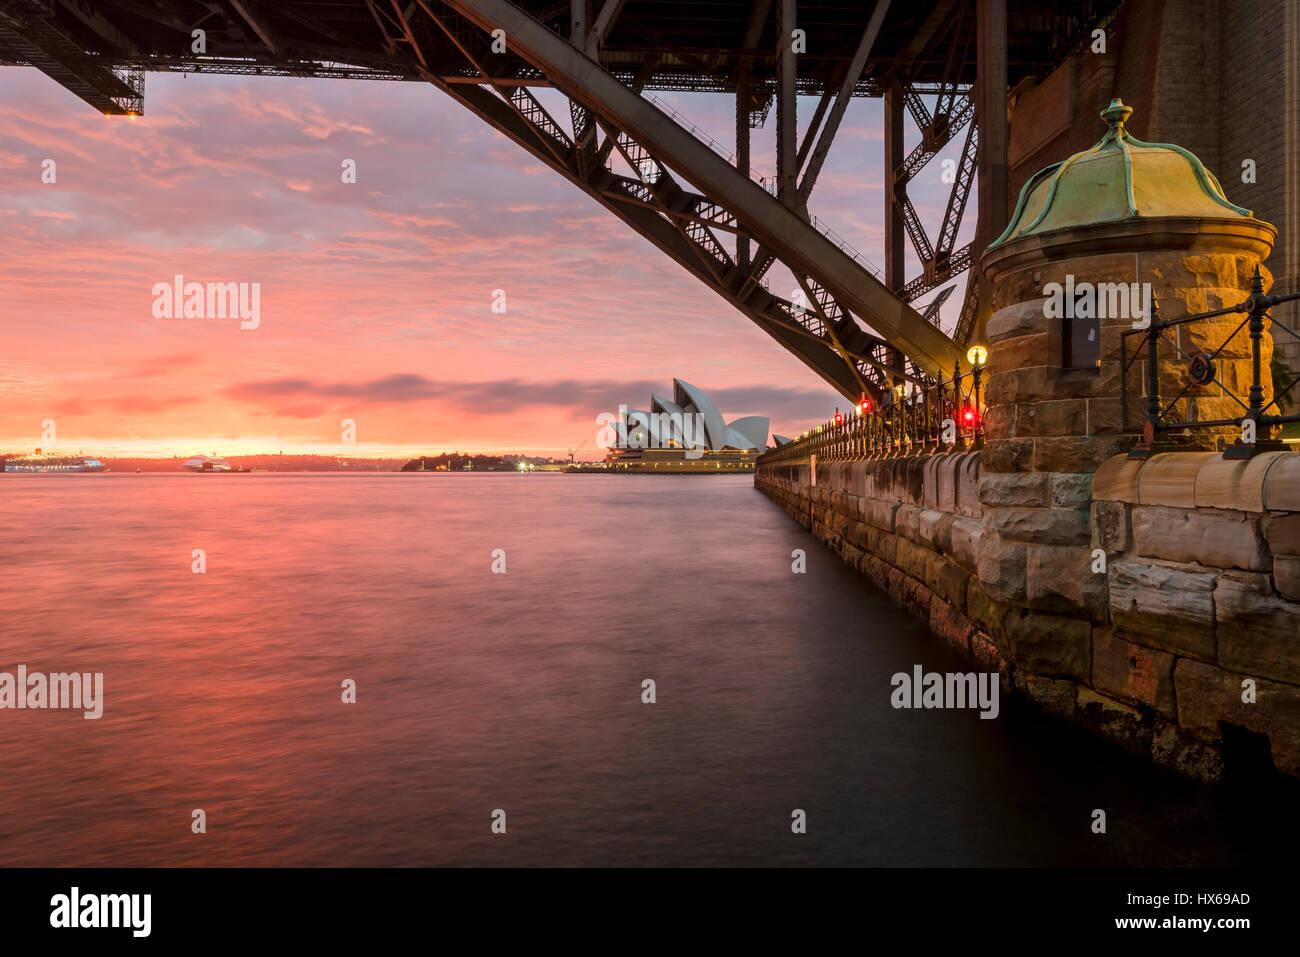 Sydney Opera House at dawn viewed from under the Sydney Harbor Bridge - Stock Image